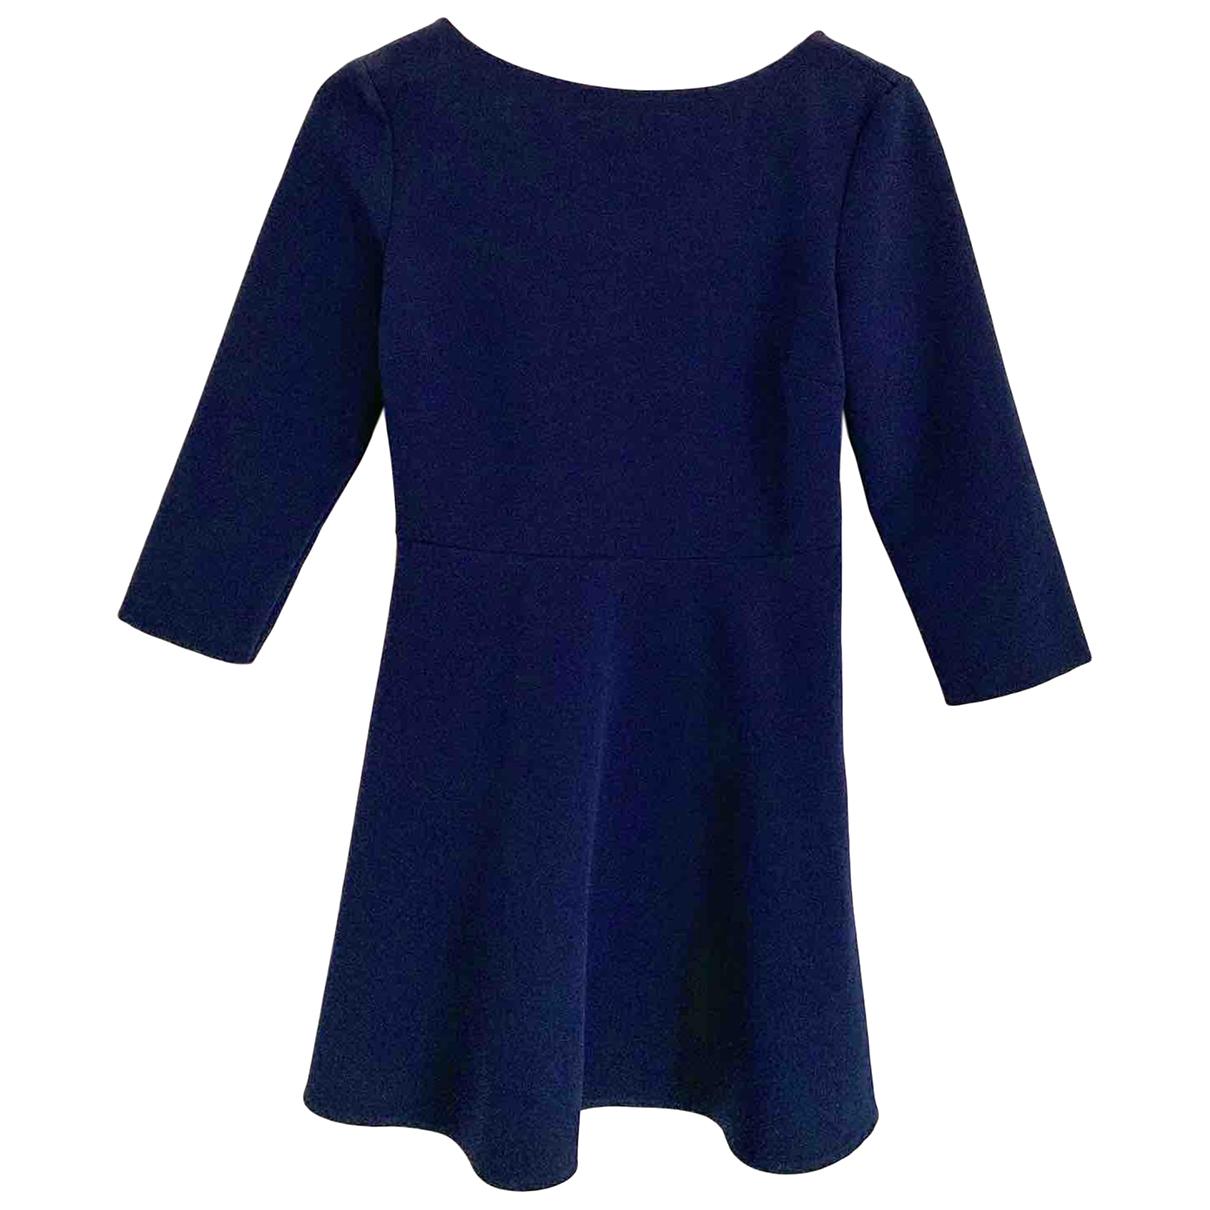 Zara \N Navy dress for Women S International